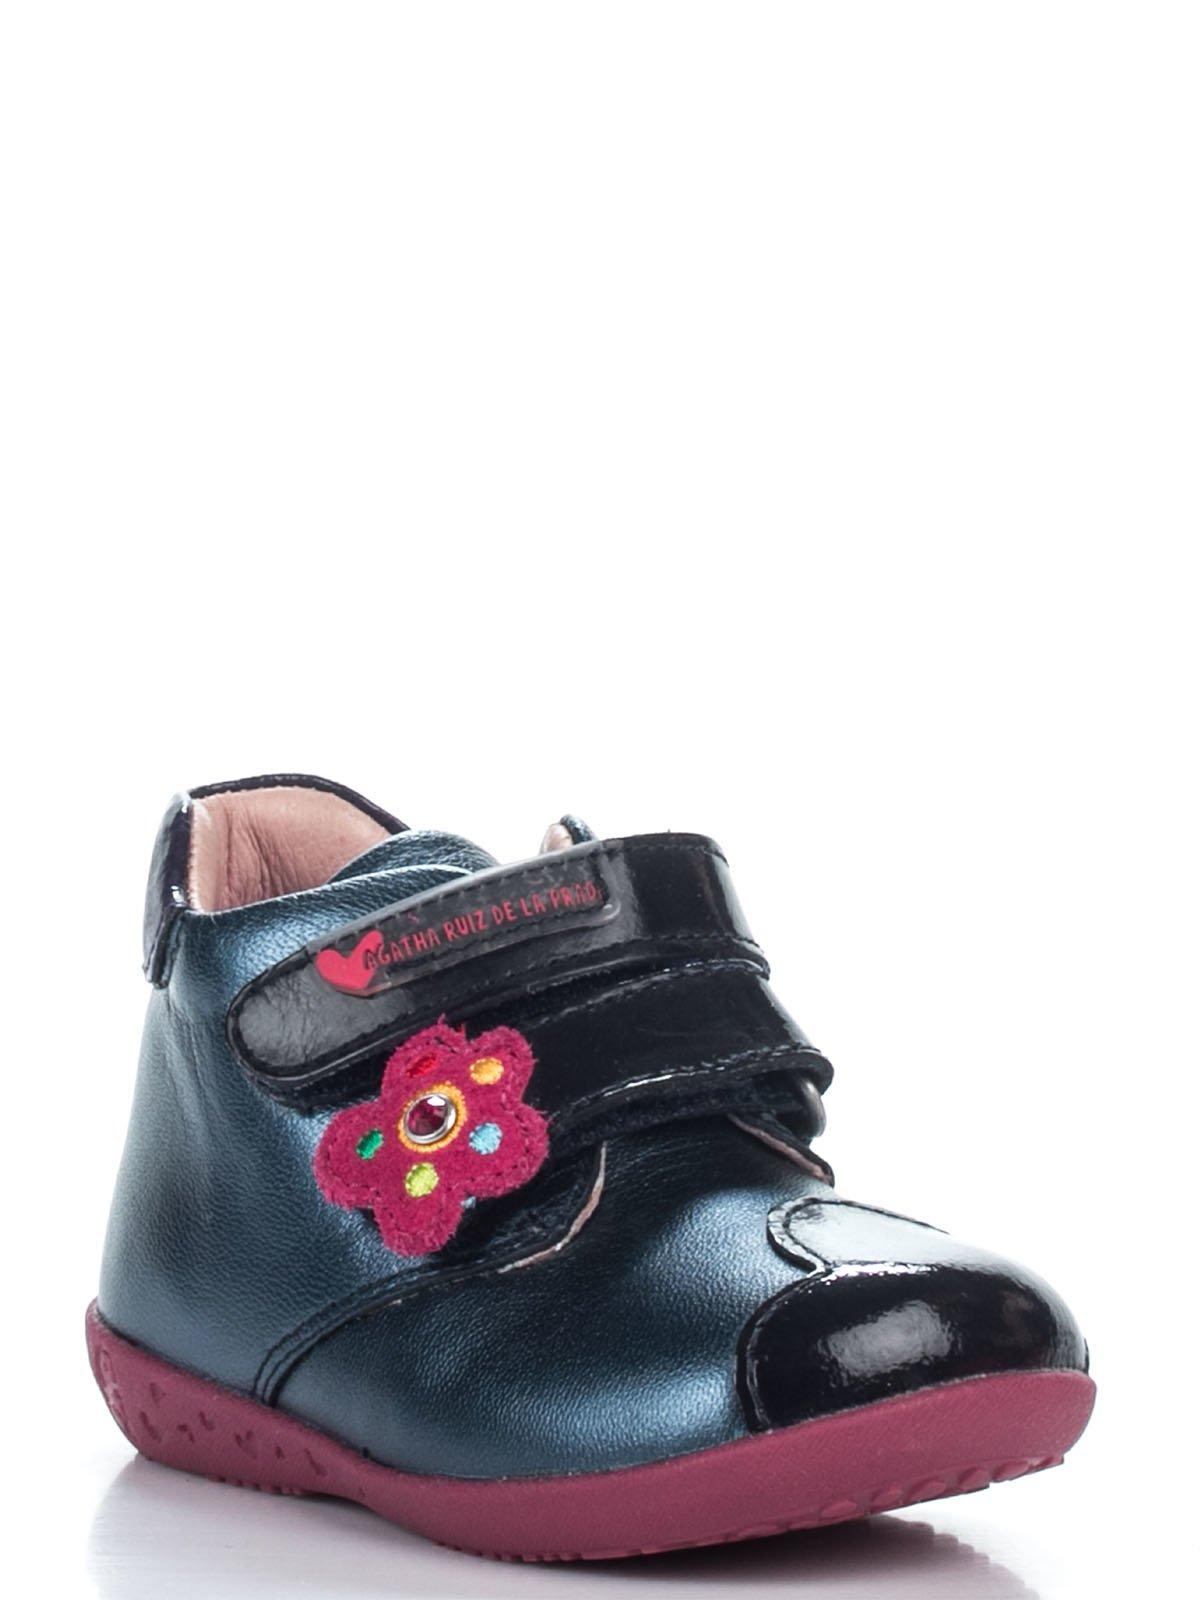 Ботинки синие с декором | 2361614